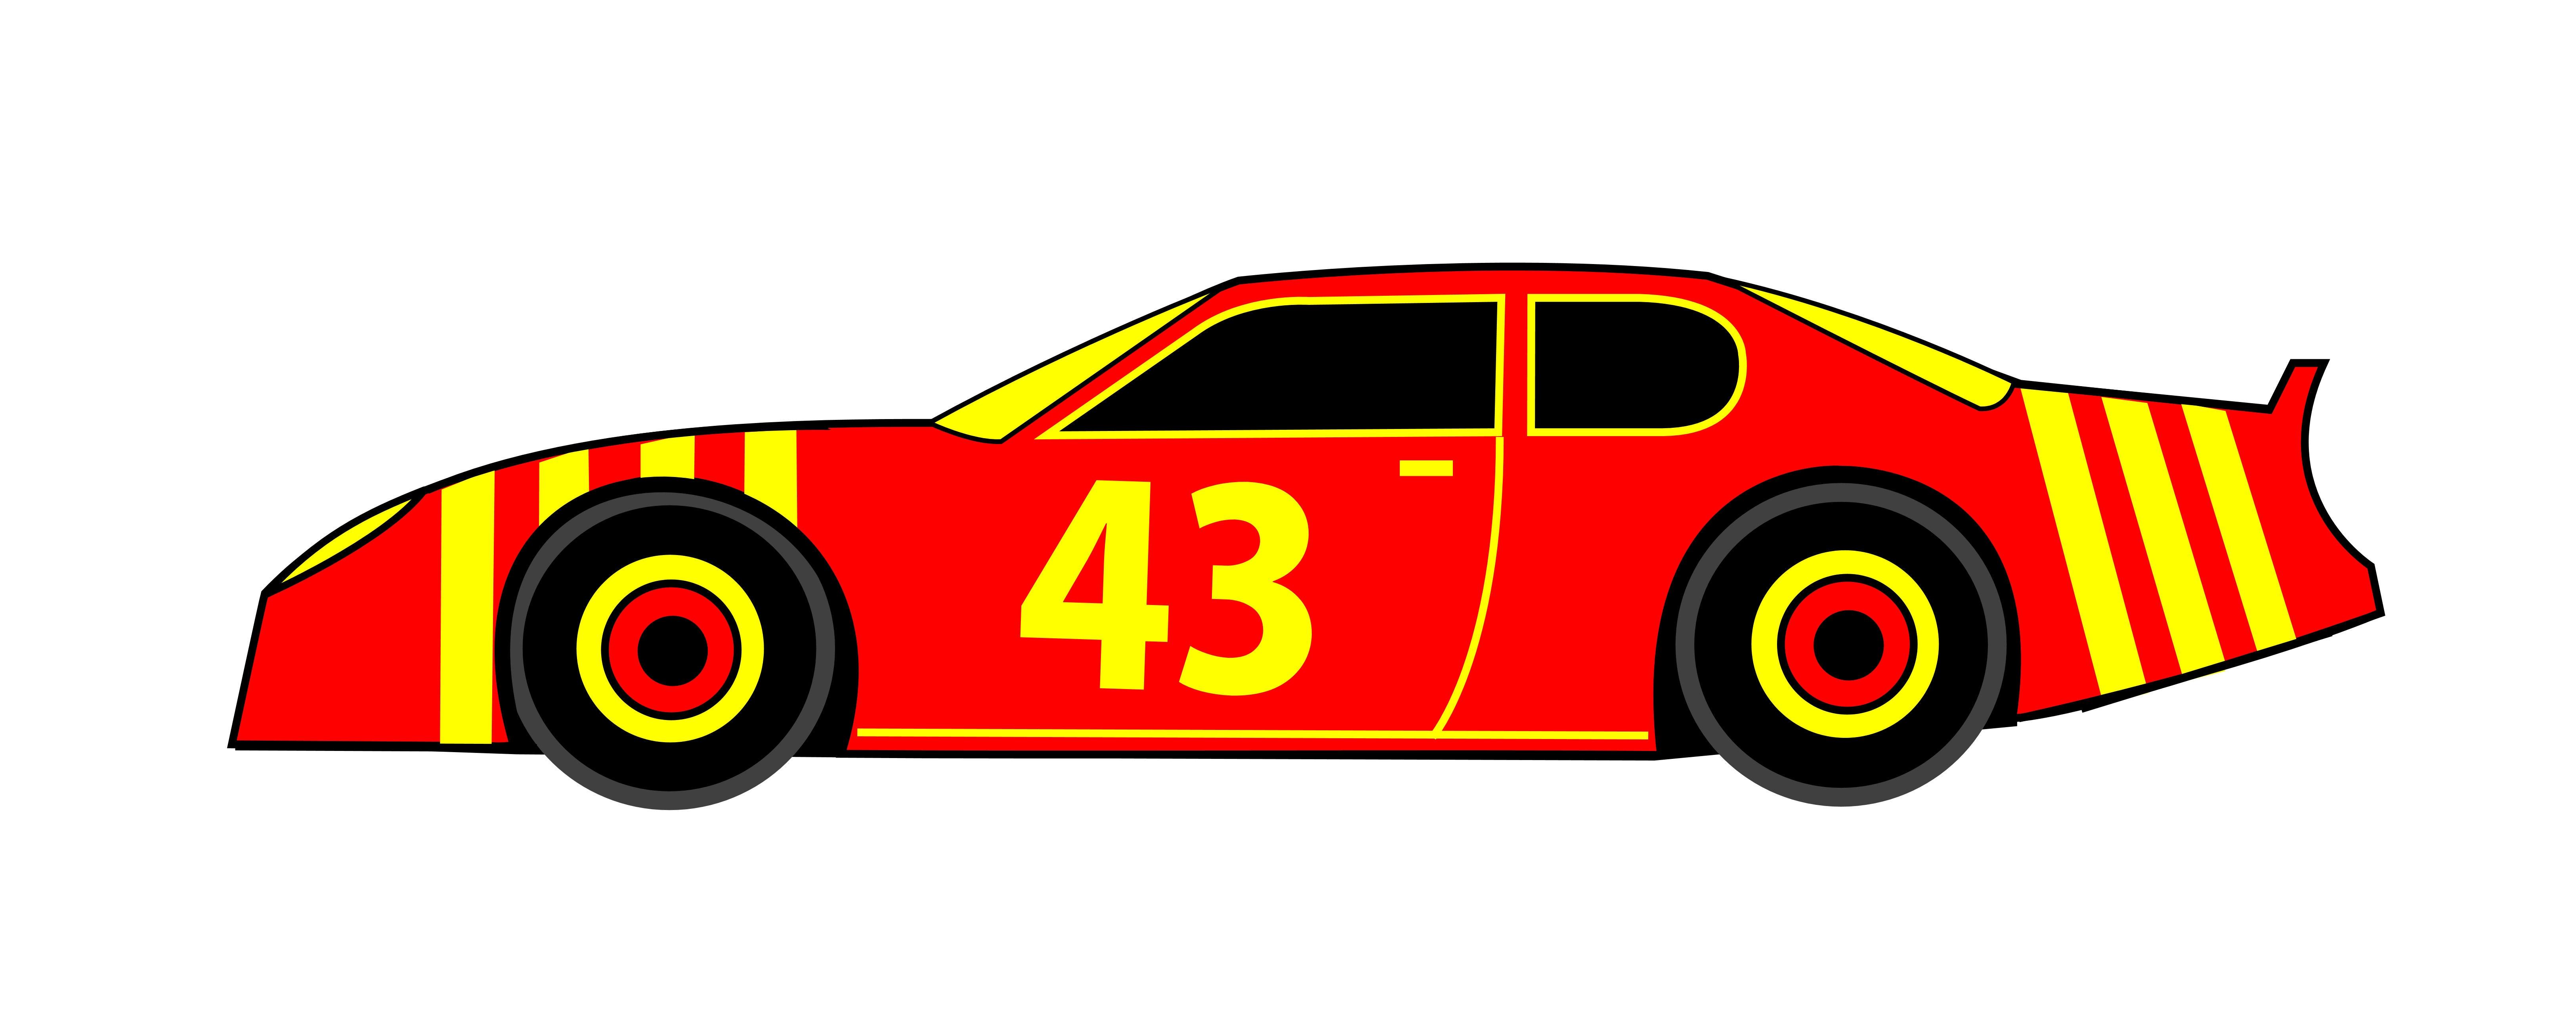 Nascar Race Car Clip Art ..-Nascar Race Car Clip Art ..-10